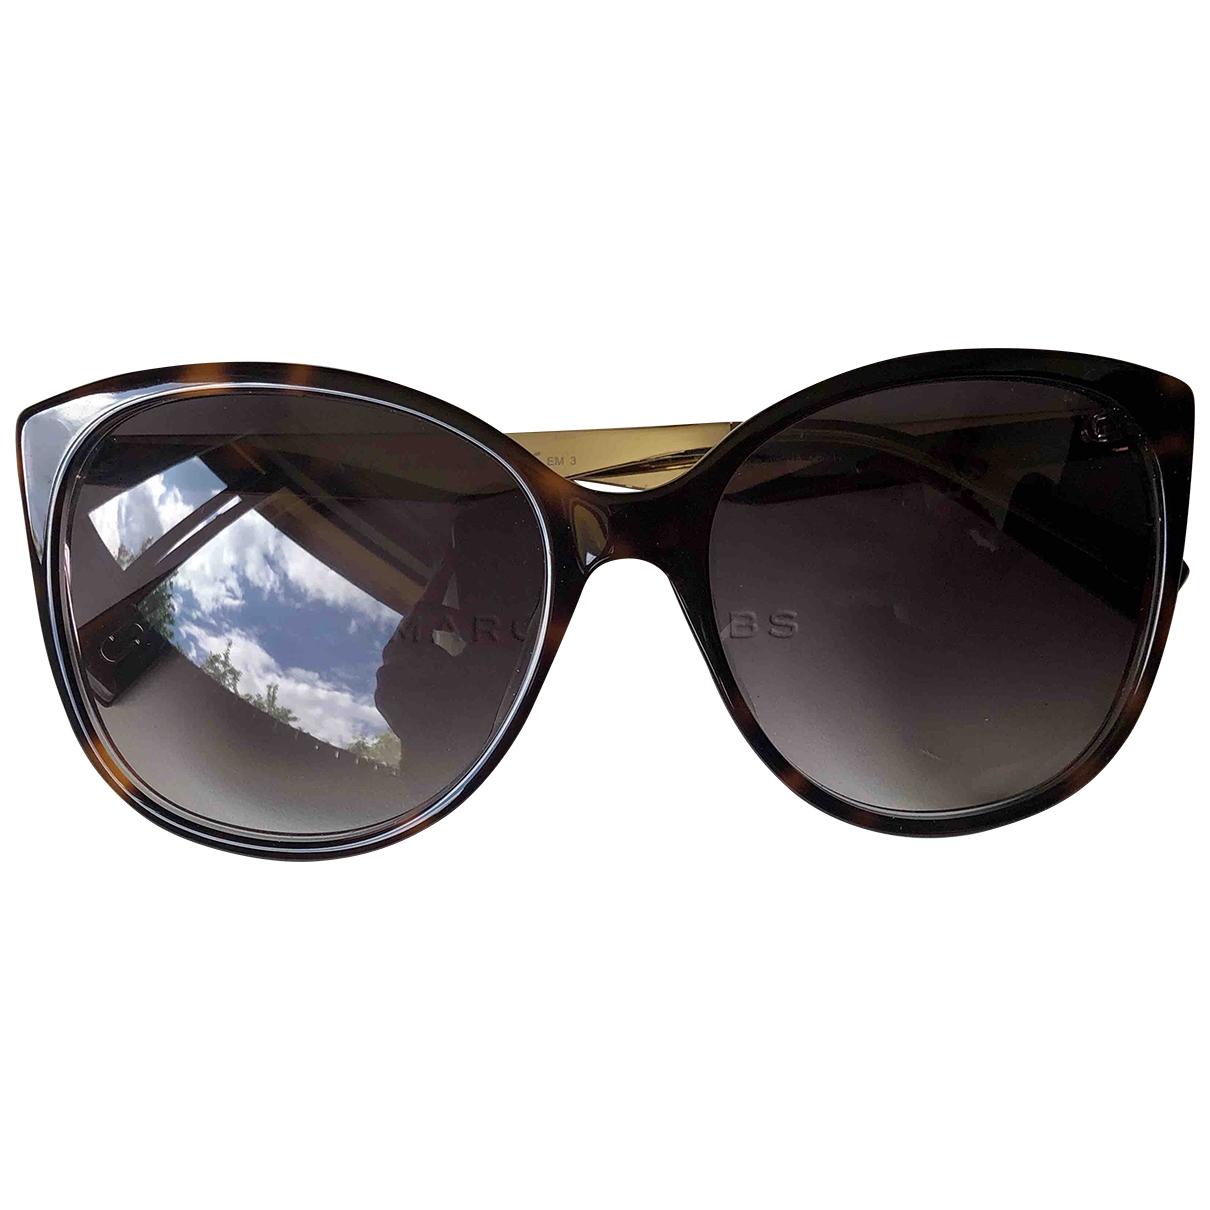 Marc Jacobs \N Brown Sunglasses for Women \N